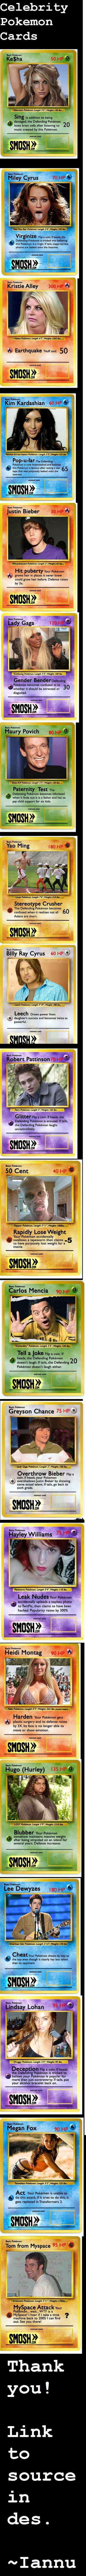 Celebrity Pokemon. Links! www.smosh.com/smosh-pit/lists/celebrity-pokemon-cards.. I looked up that Greyson Chance kid. He's actually pretty talented Pokemon celebrity smosh Awesome